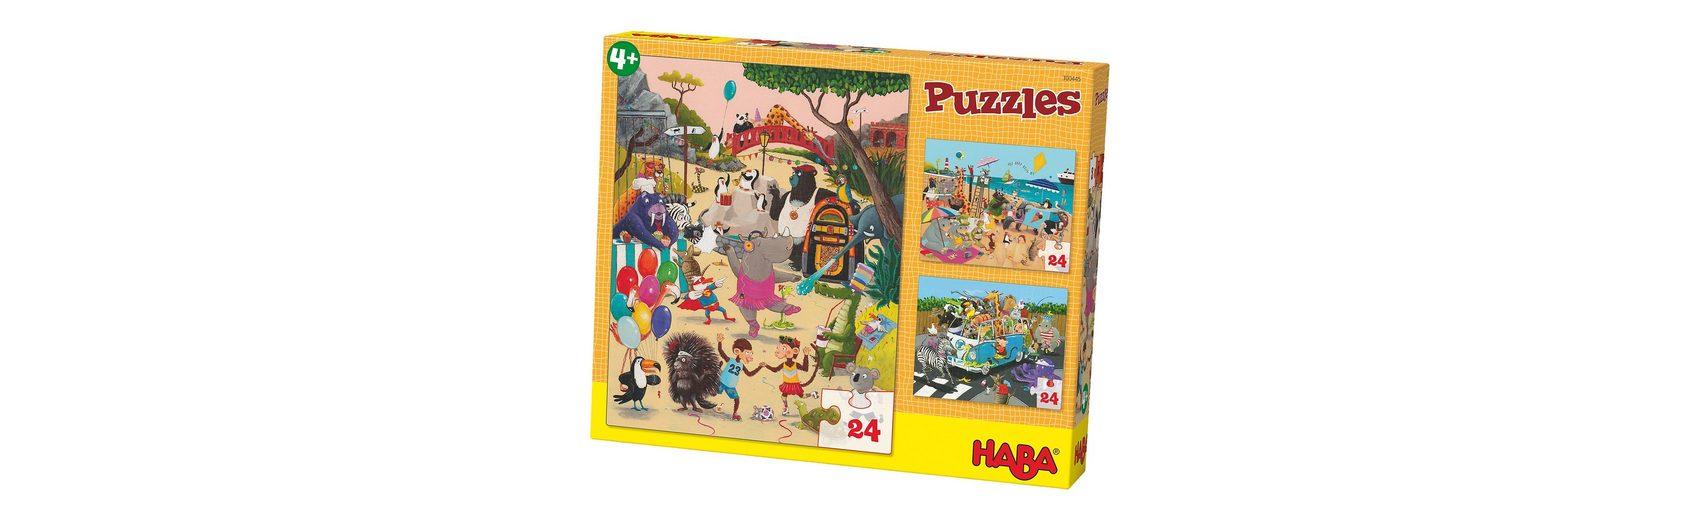 Haba 3er Puzzle-Set - Verrückte Tiere - 24 Teile